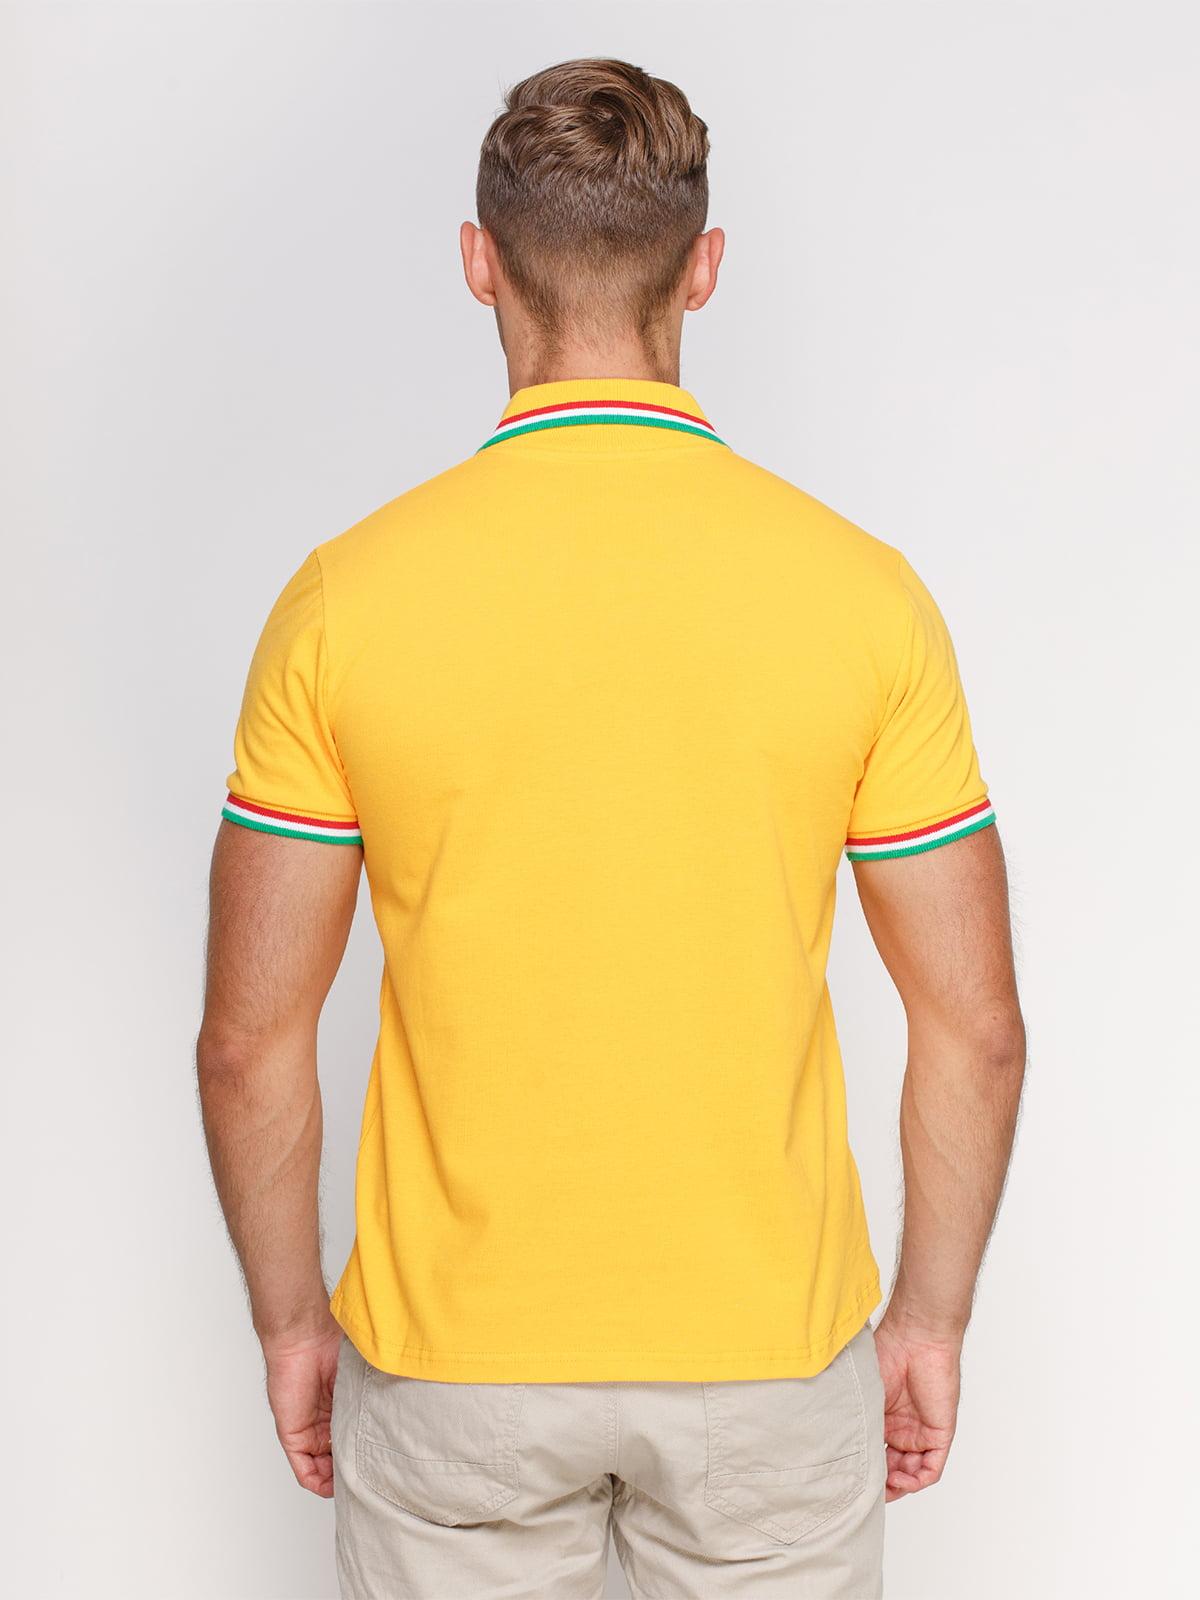 Футболка-поло жовта | 4578212 | фото 2